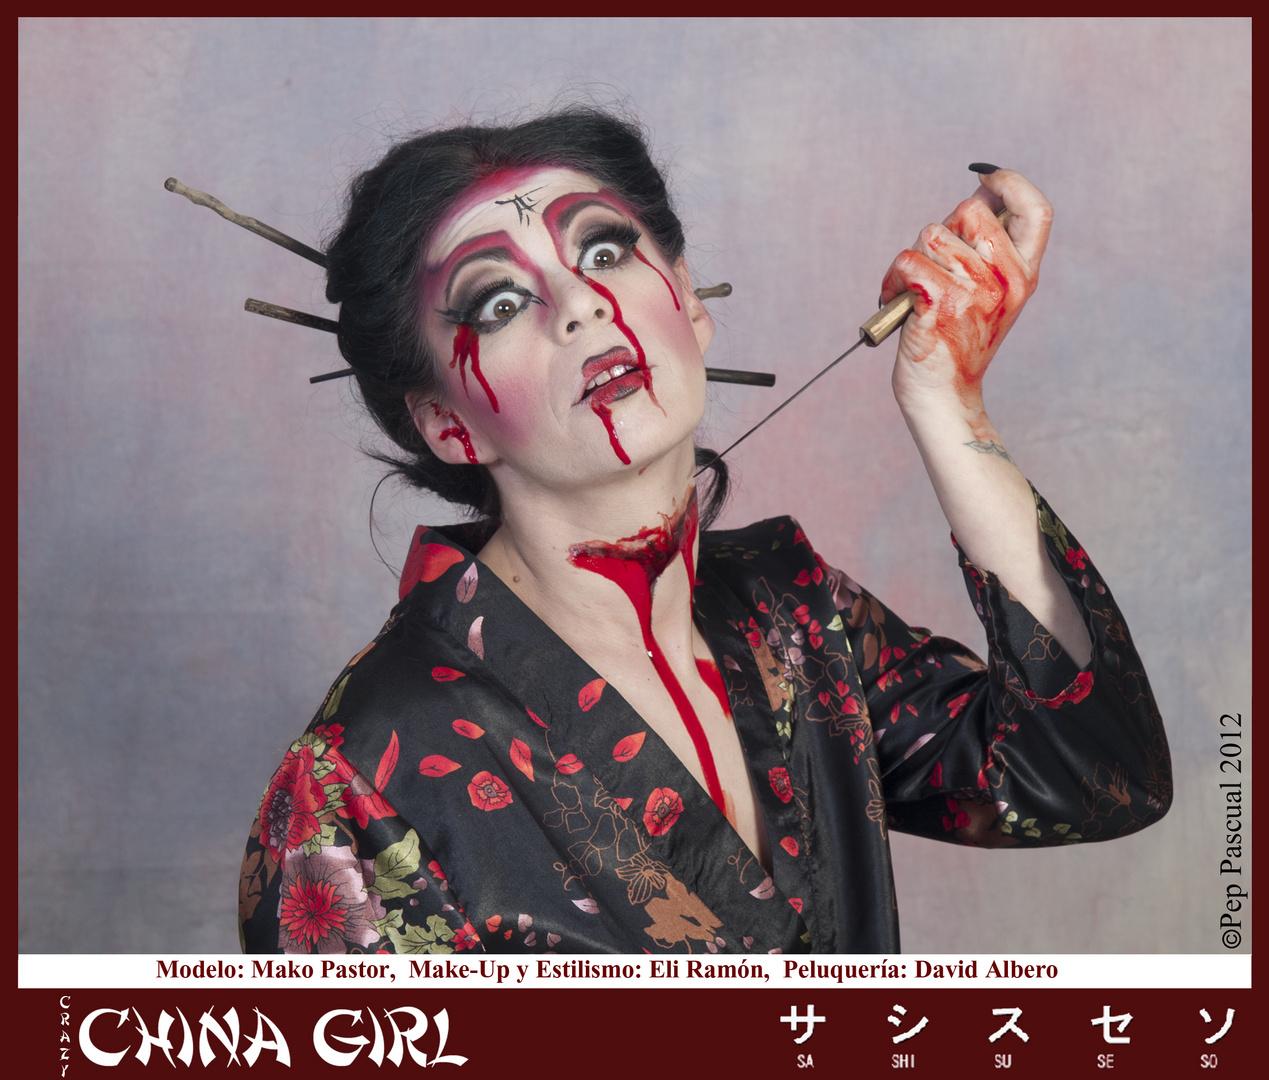 Crazy China Girl